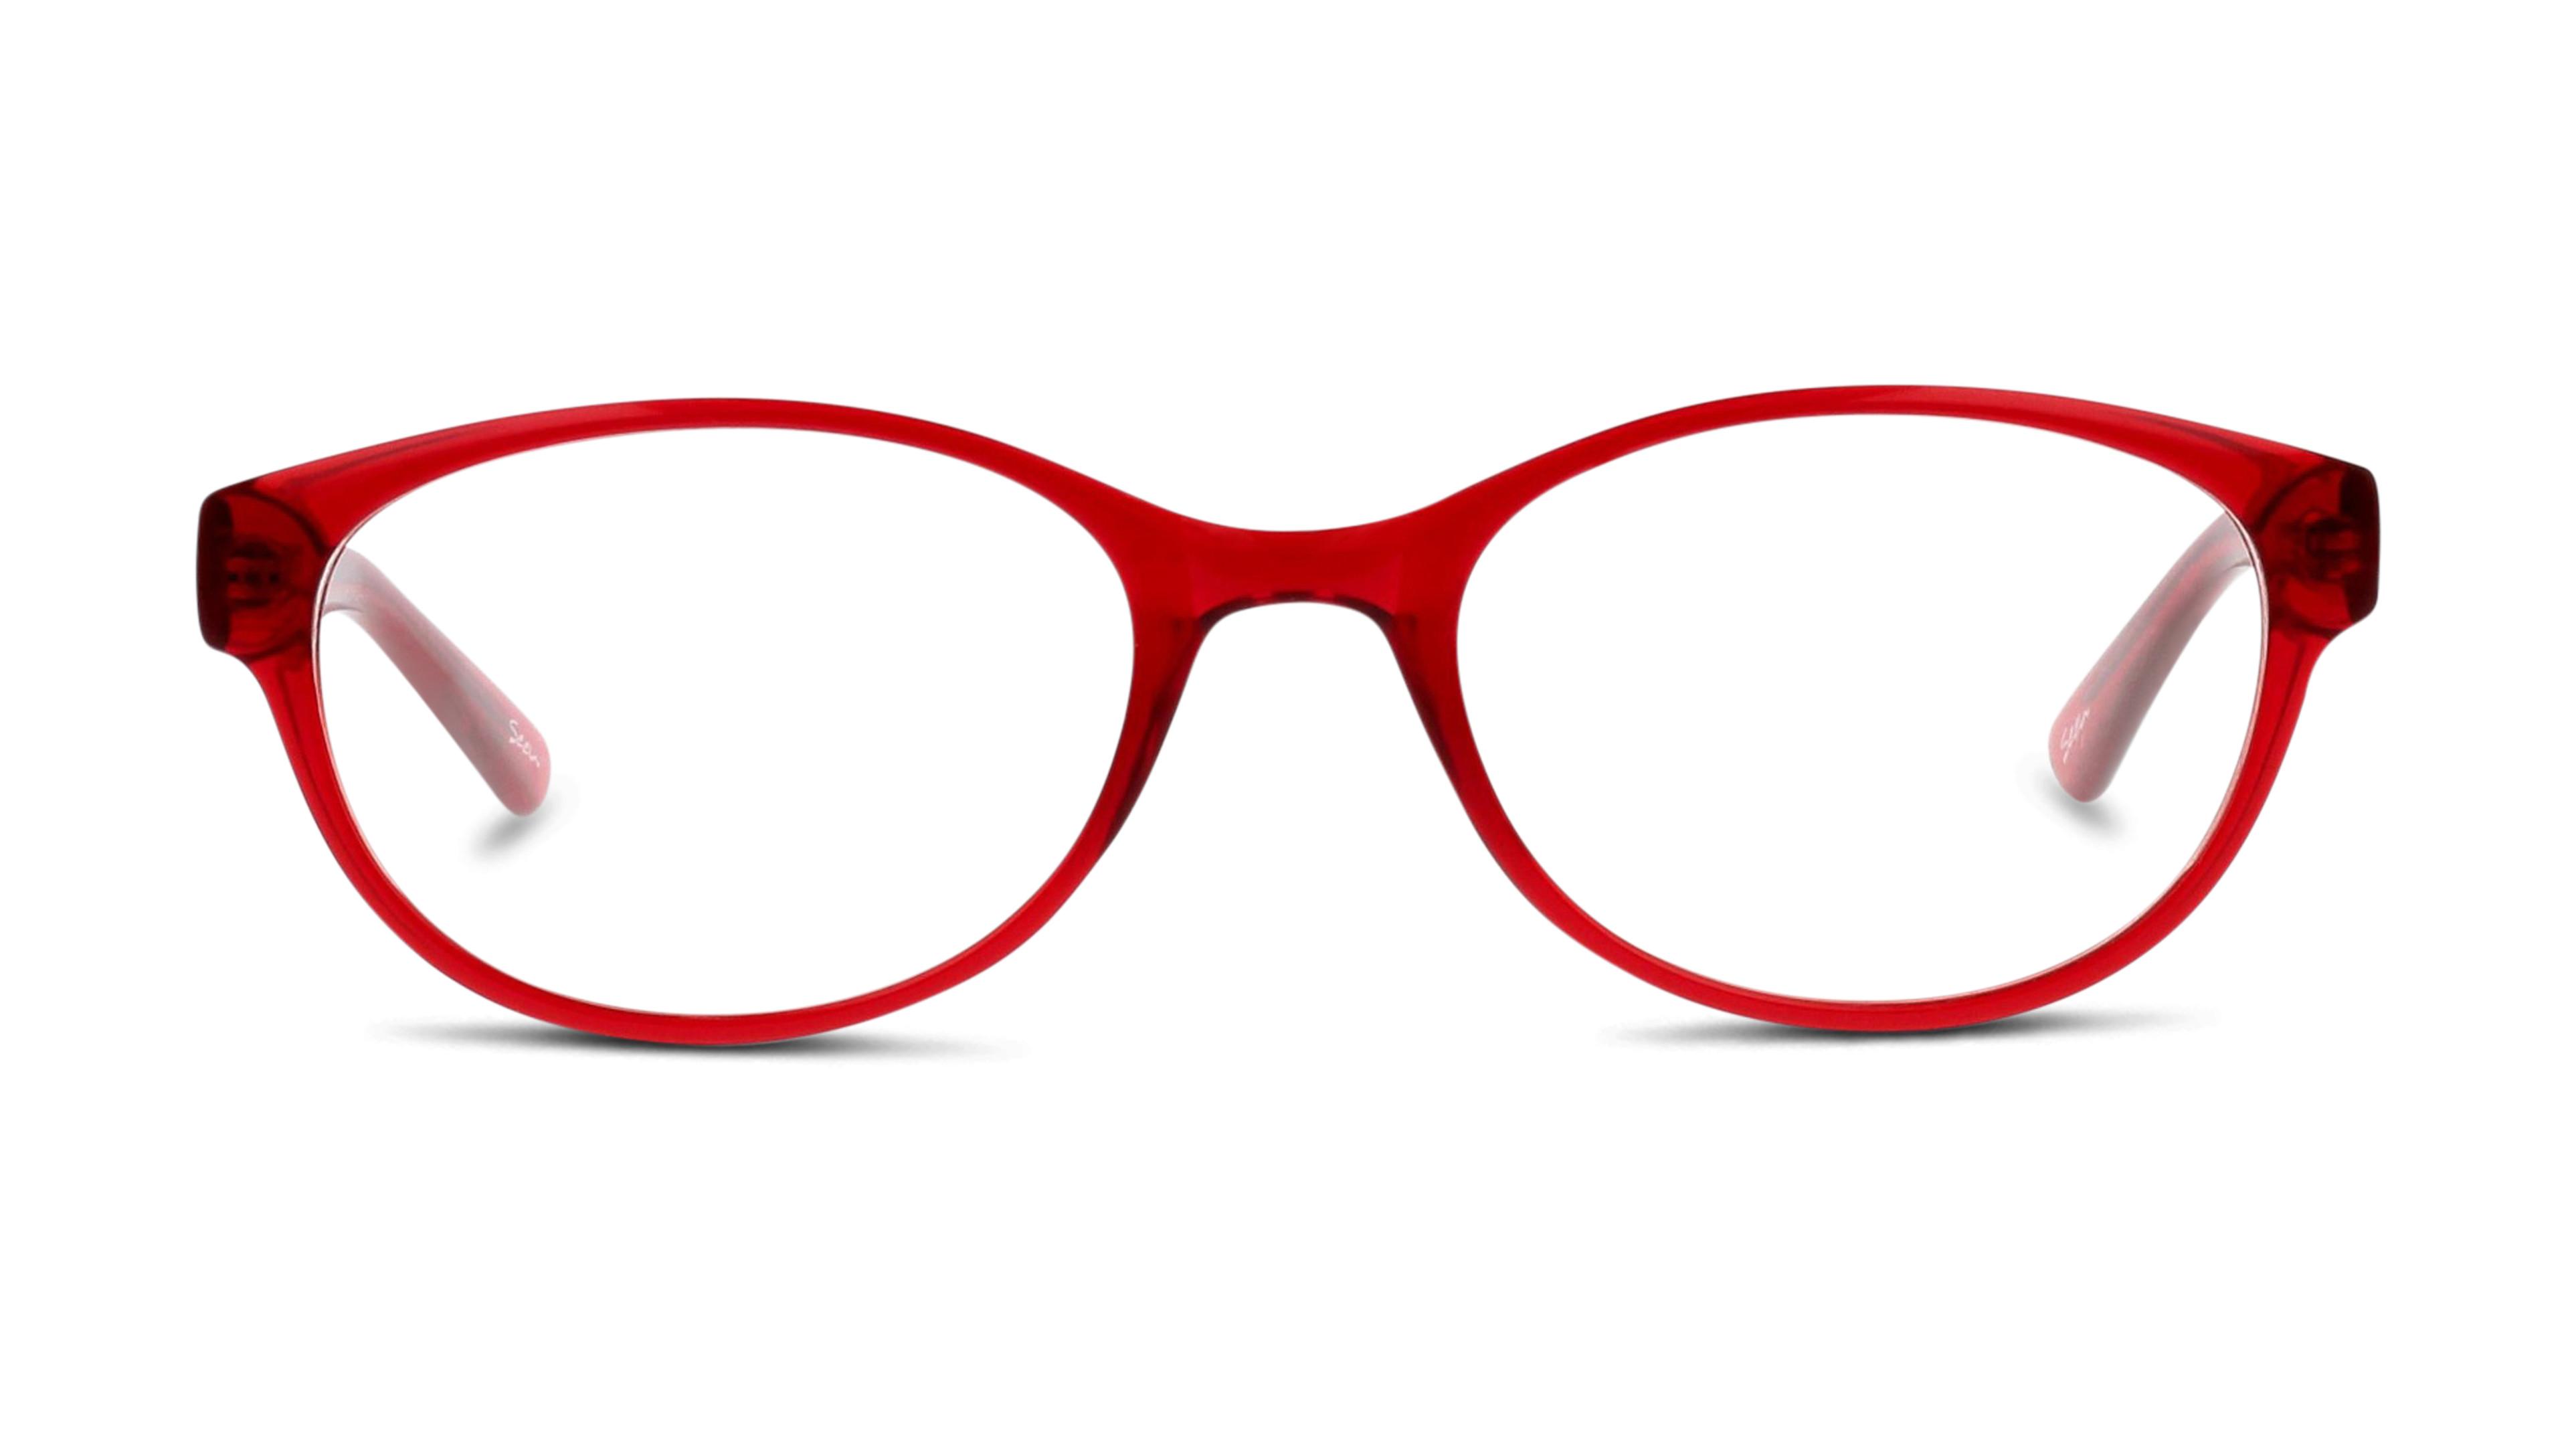 8719154595837-front-01-seen-sncf27-eyewear-red